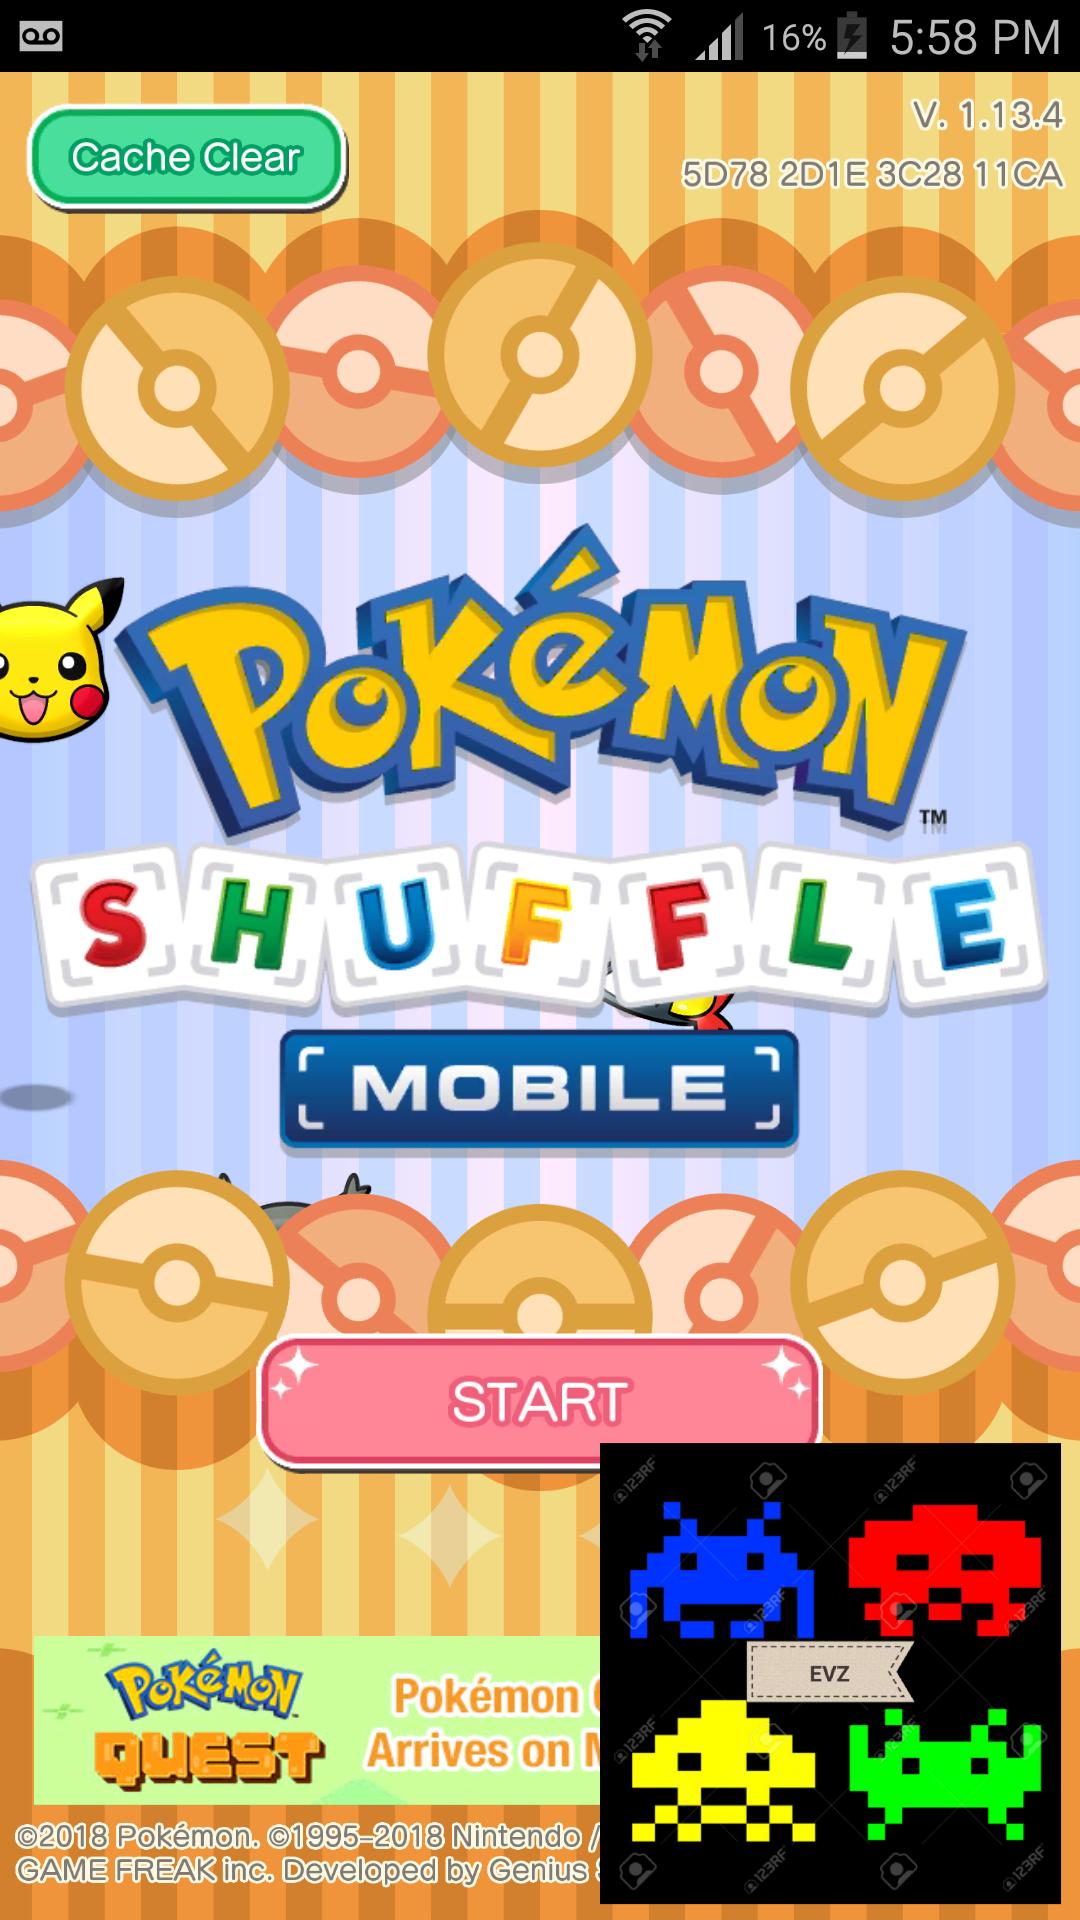 Pokemon Shuffle Mobile: Stage 014 1,362 points